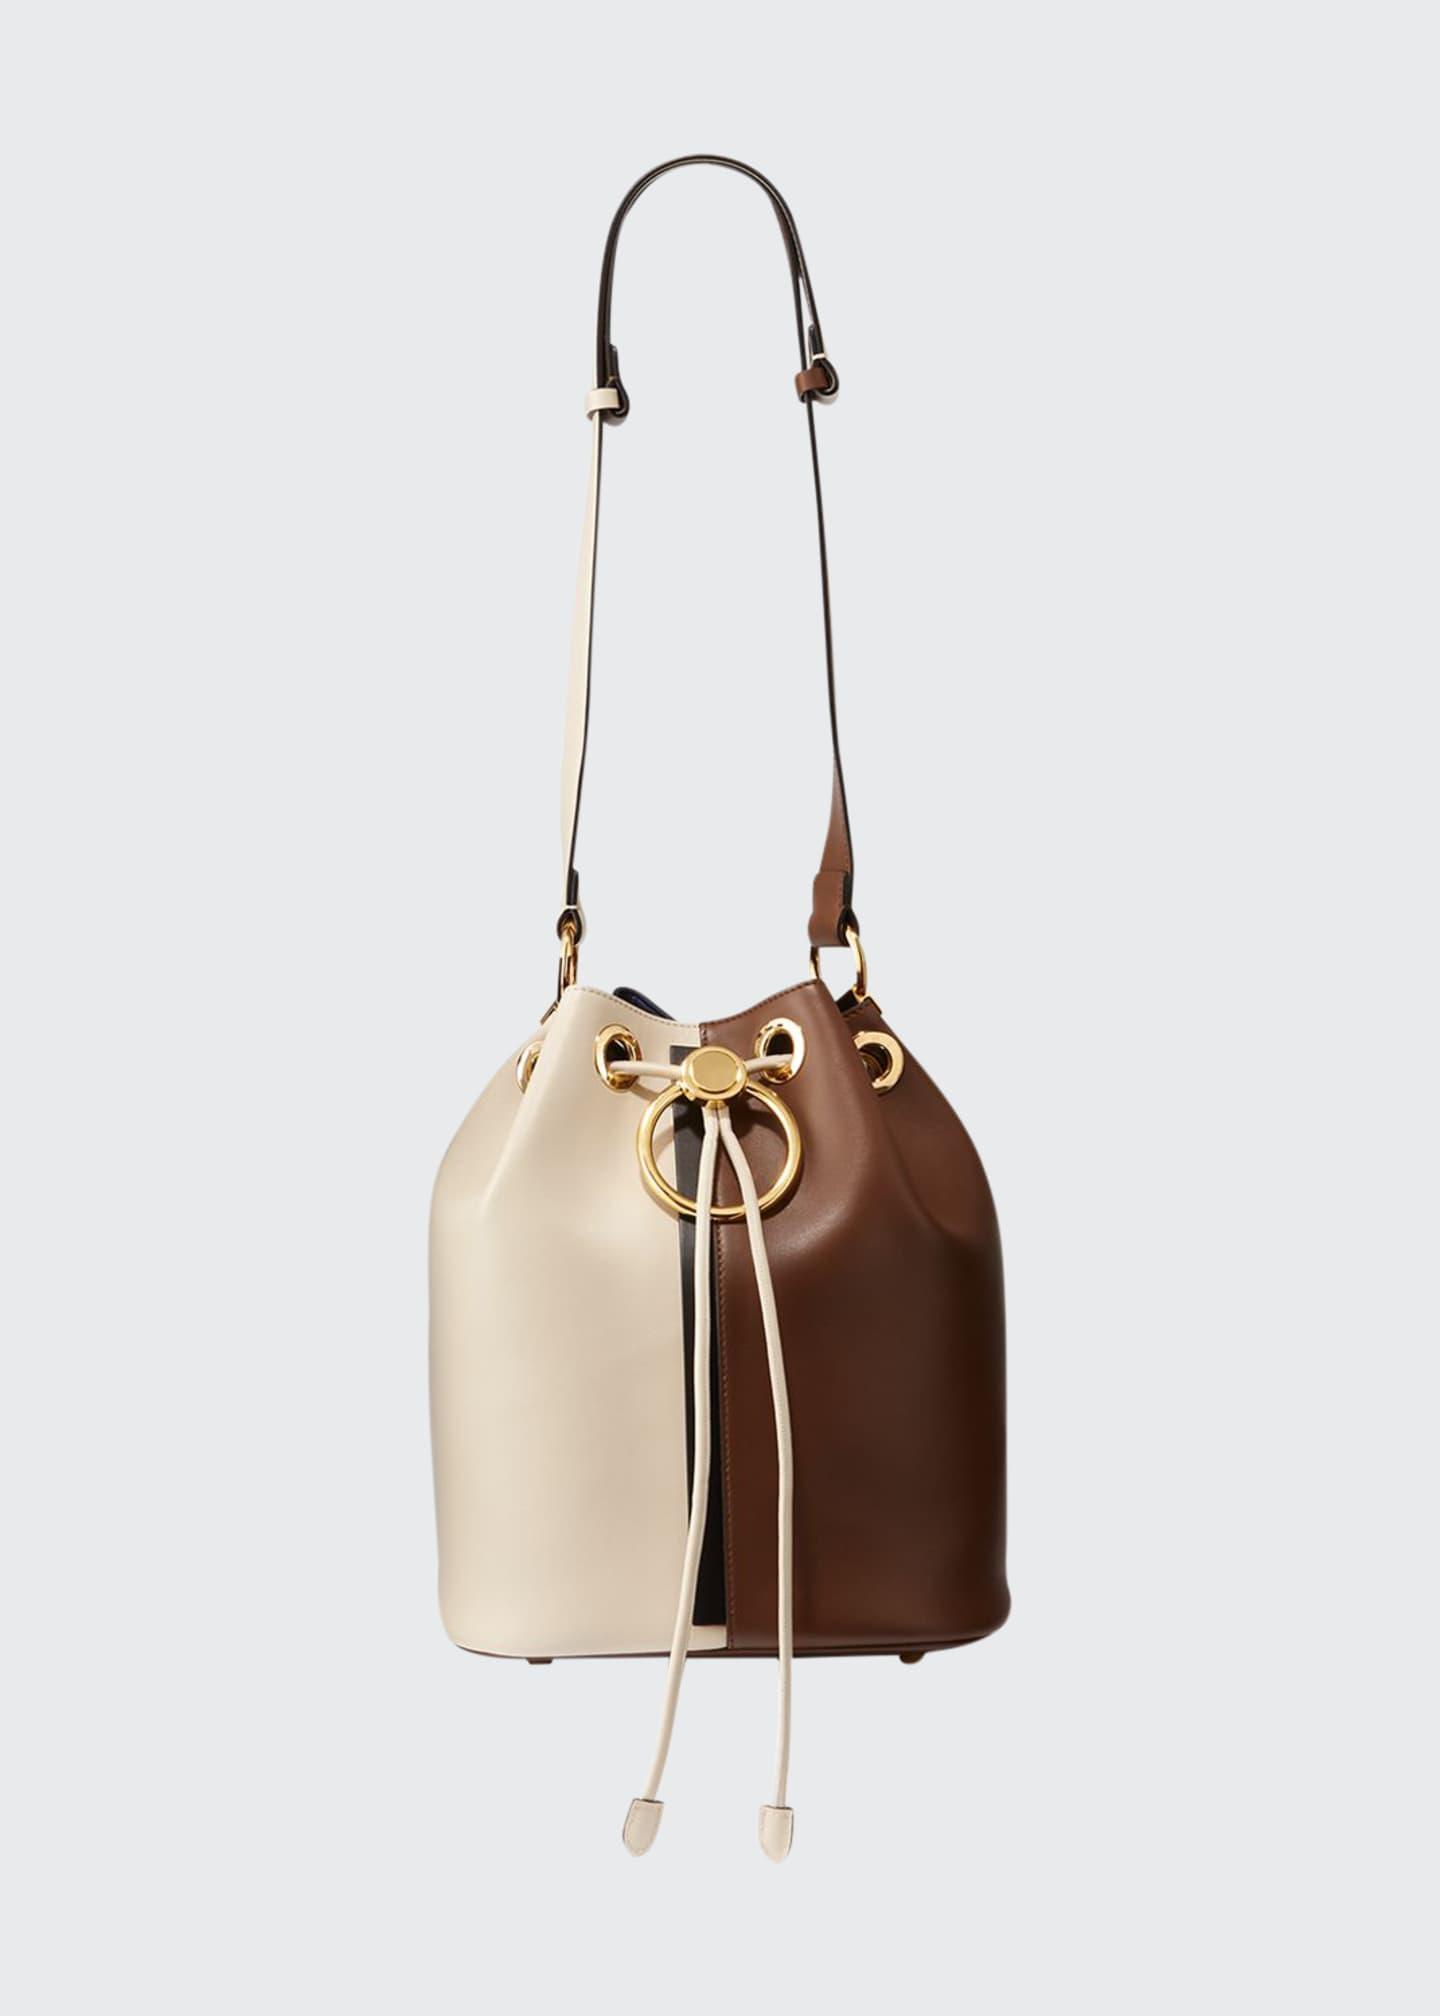 Marni Two-Tone Earring Bucket Bag